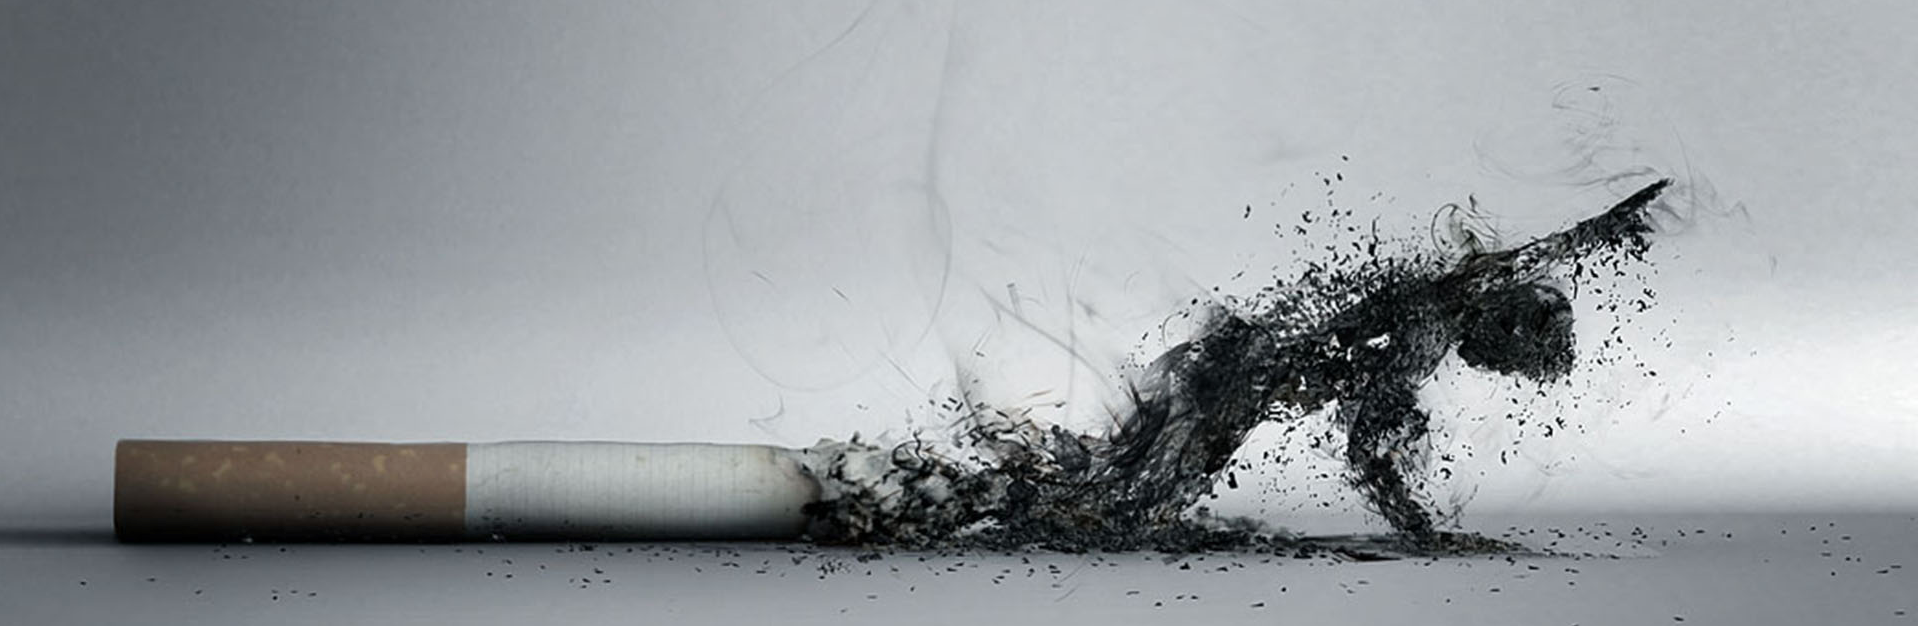 Interdiction_tabac